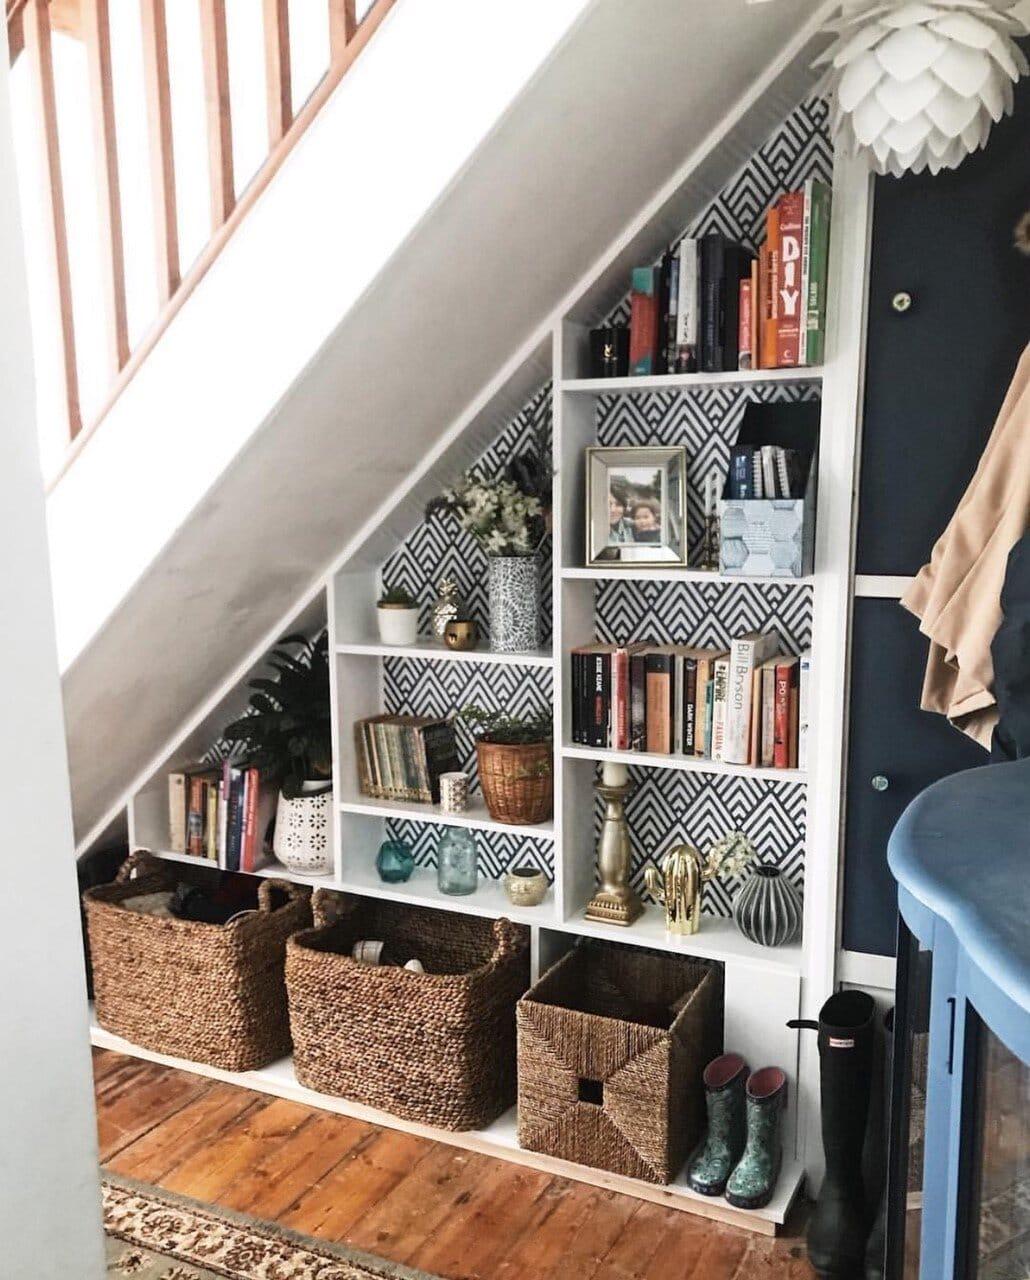 interior design, instagram, instagram trends, home decor, social media, blogging, instagram advice, blogging advice, pinterest, shelfie, bookcase, hallway